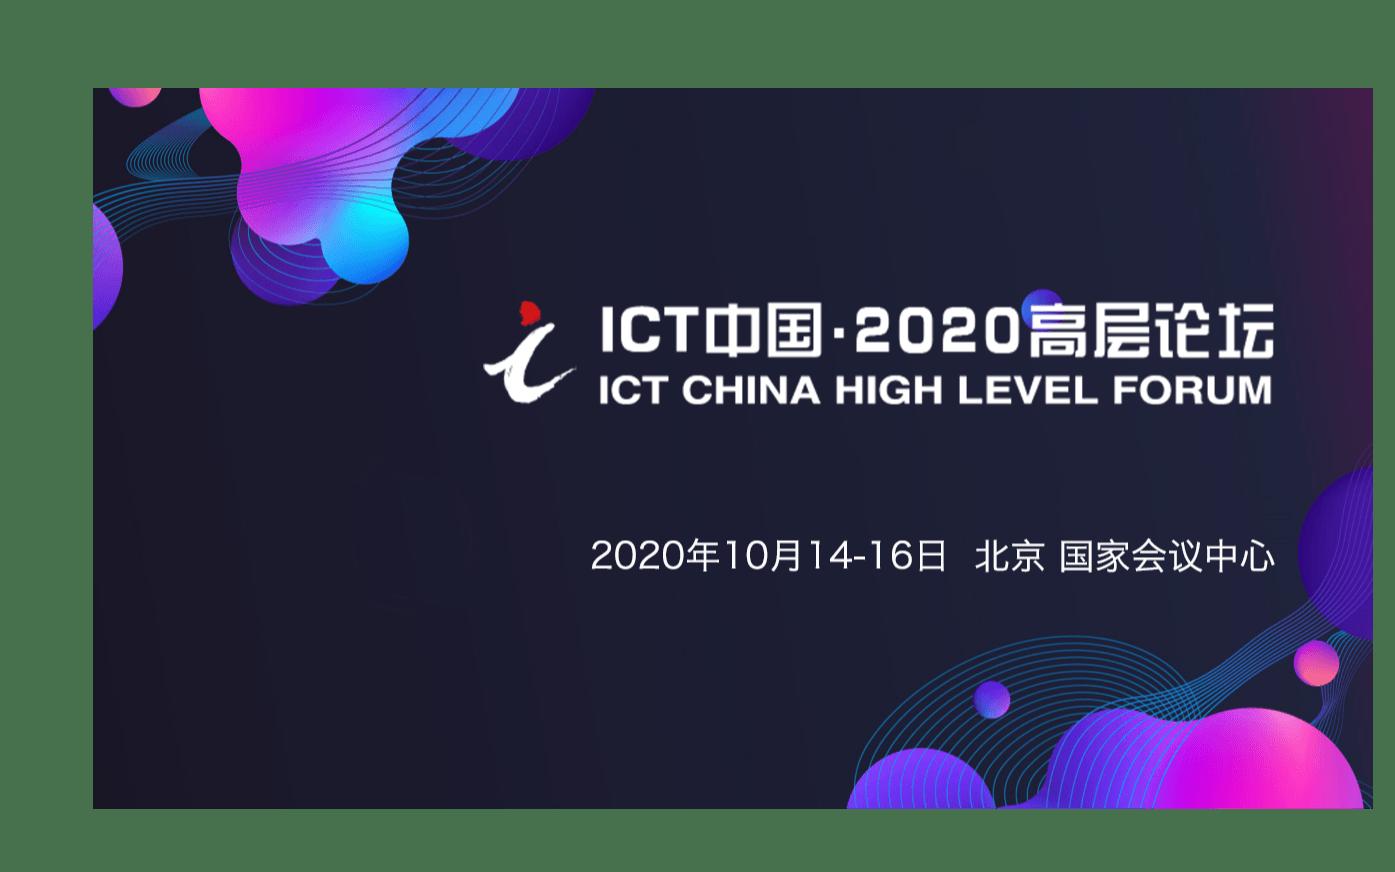 ICT中国·2020高层论坛